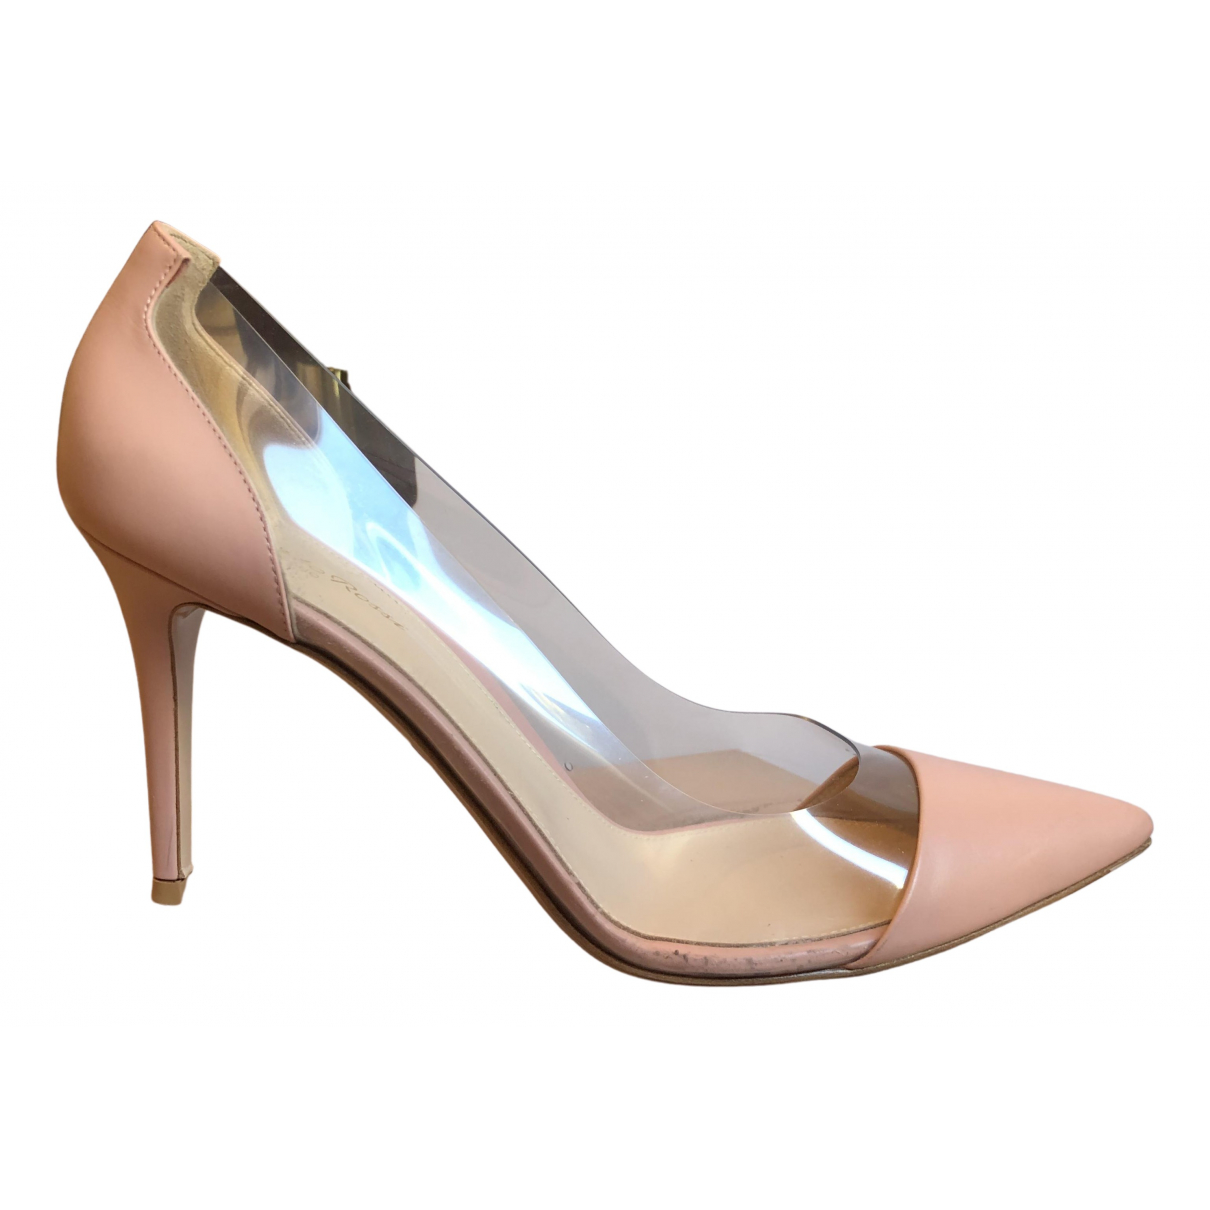 Gianvito Rossi - Escarpins Plexi pour femme en cuir - rose